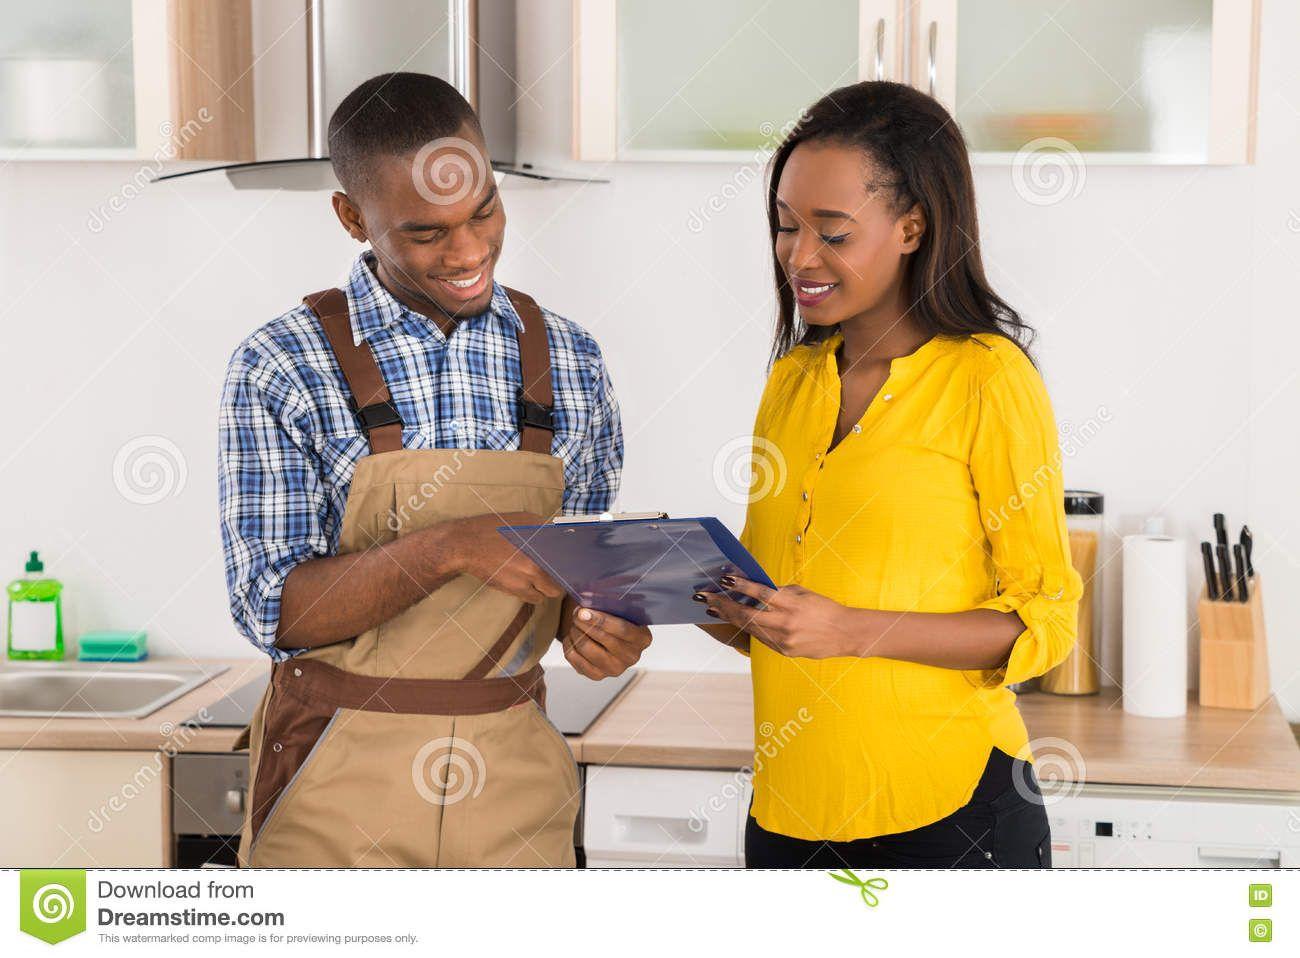 Handyman And Woman Looking At Clipboard Stock Image